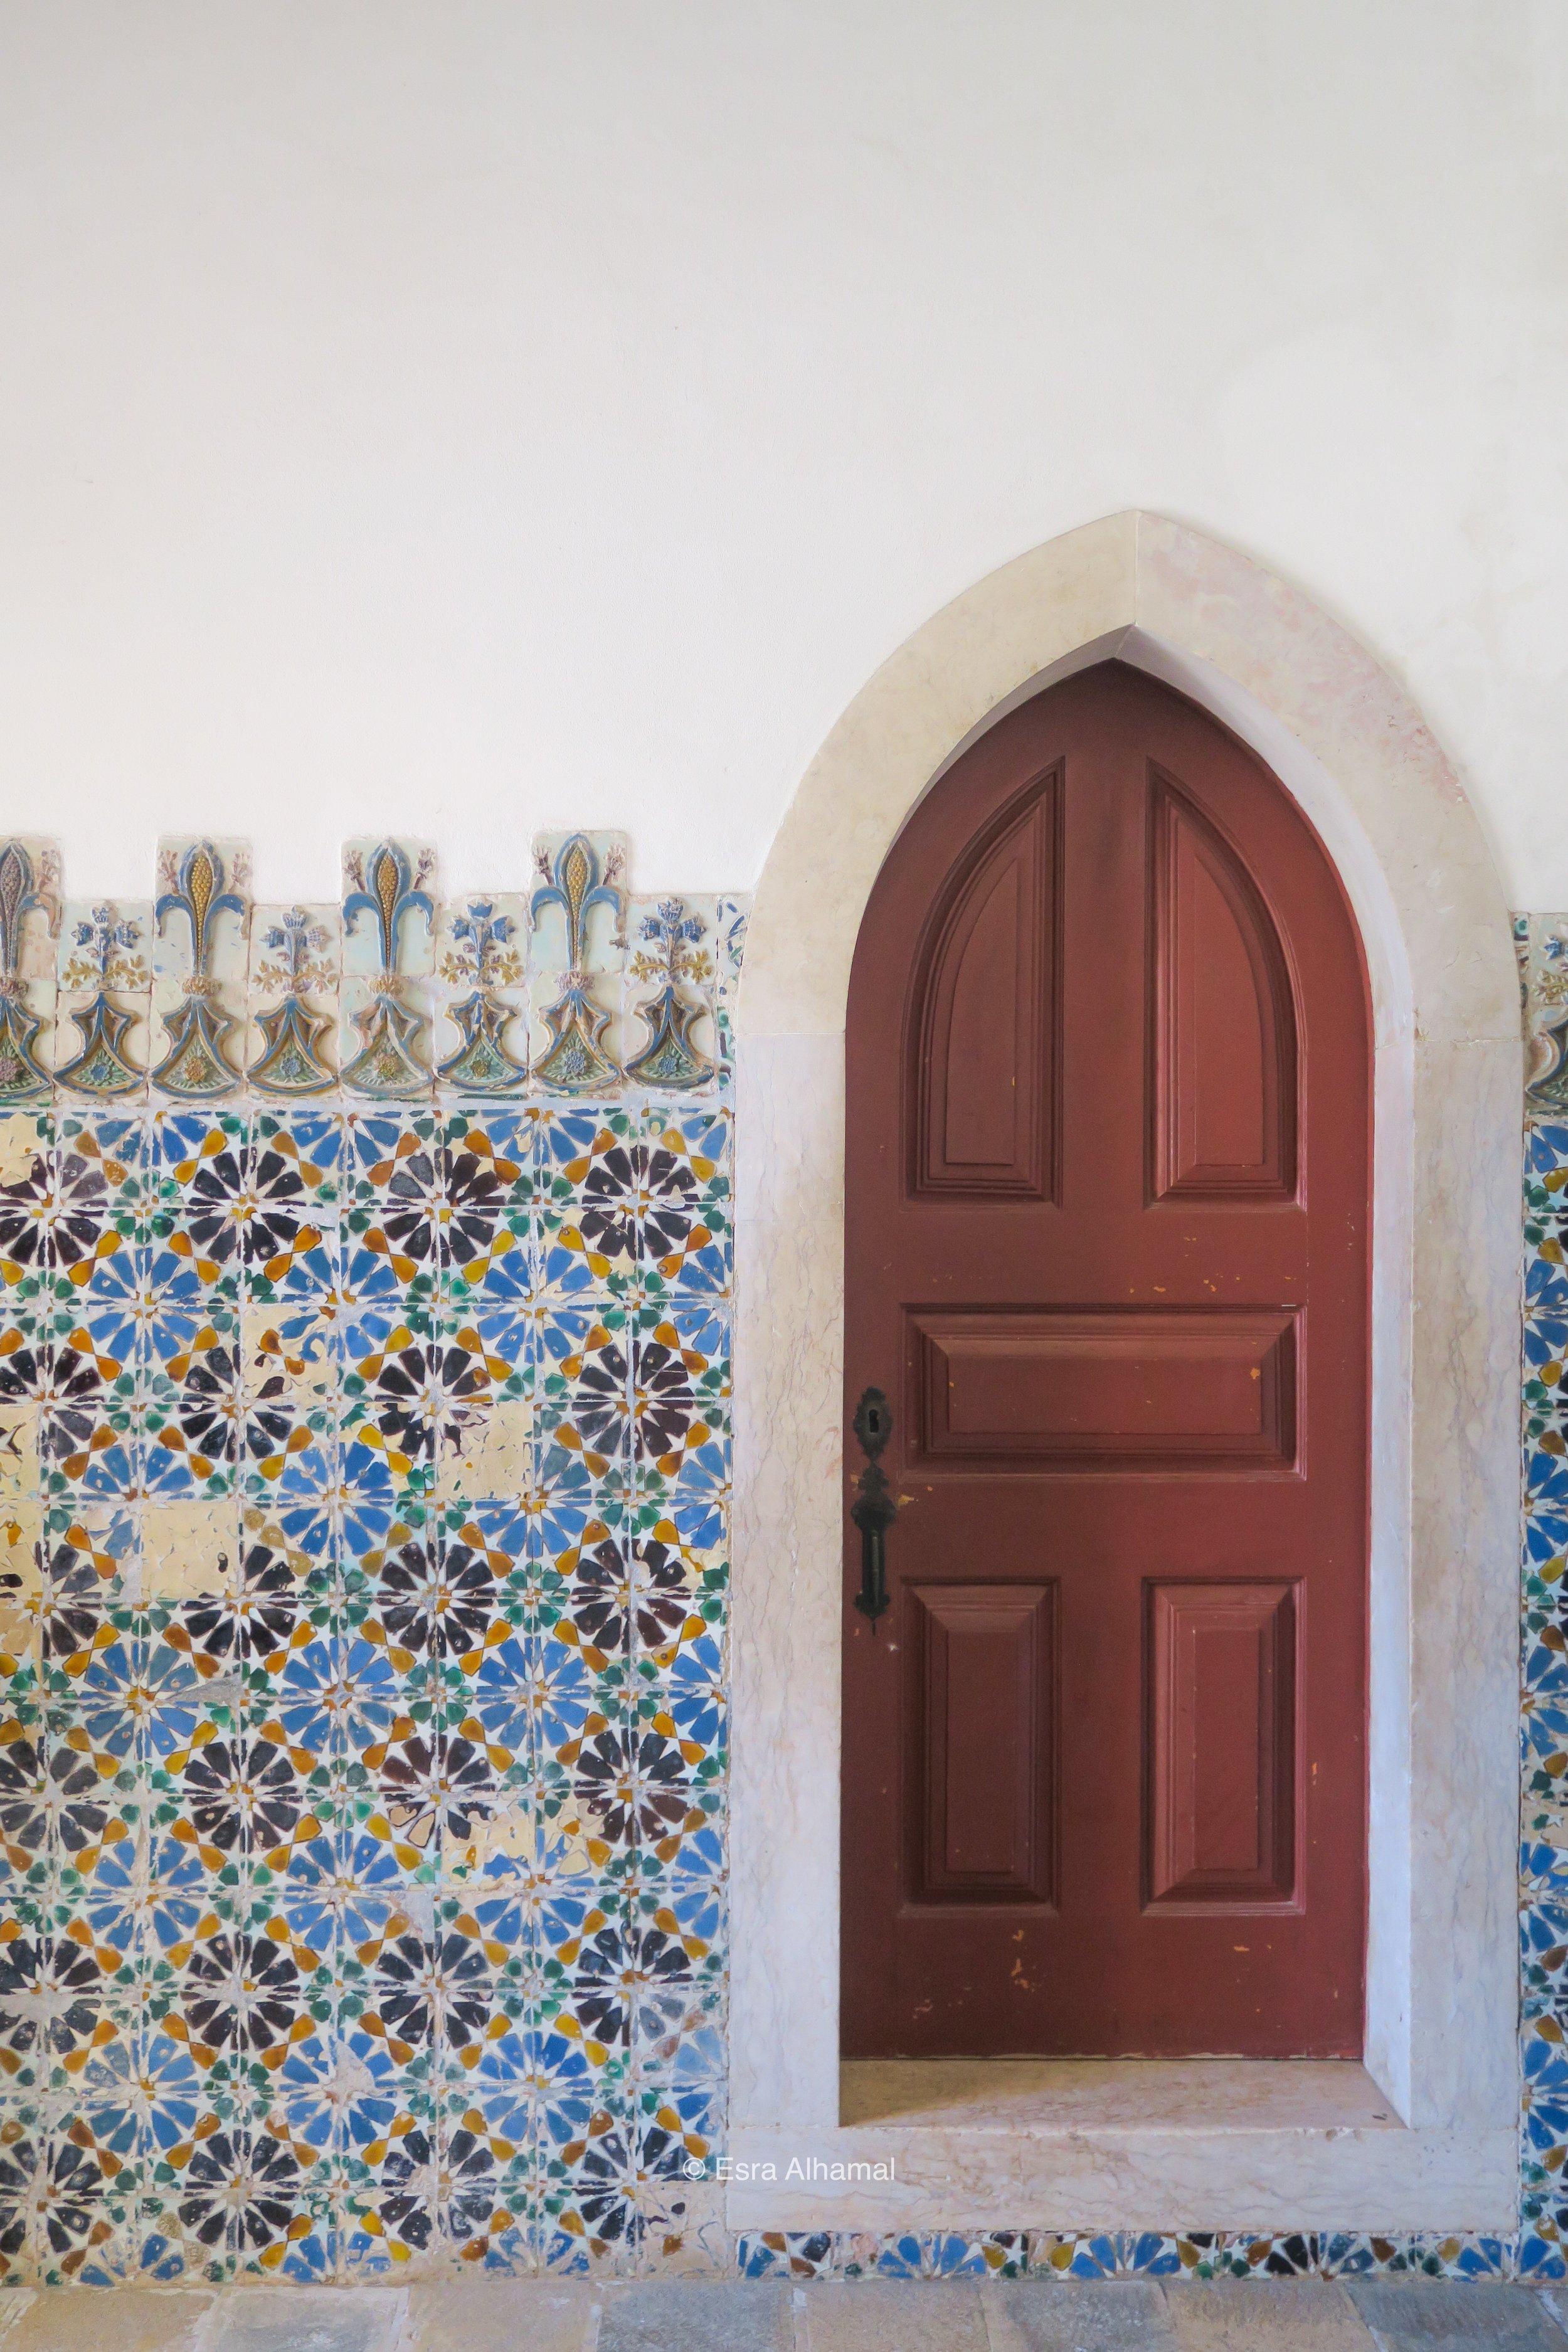 Geometric Islamic Patterns in Sintra Palace